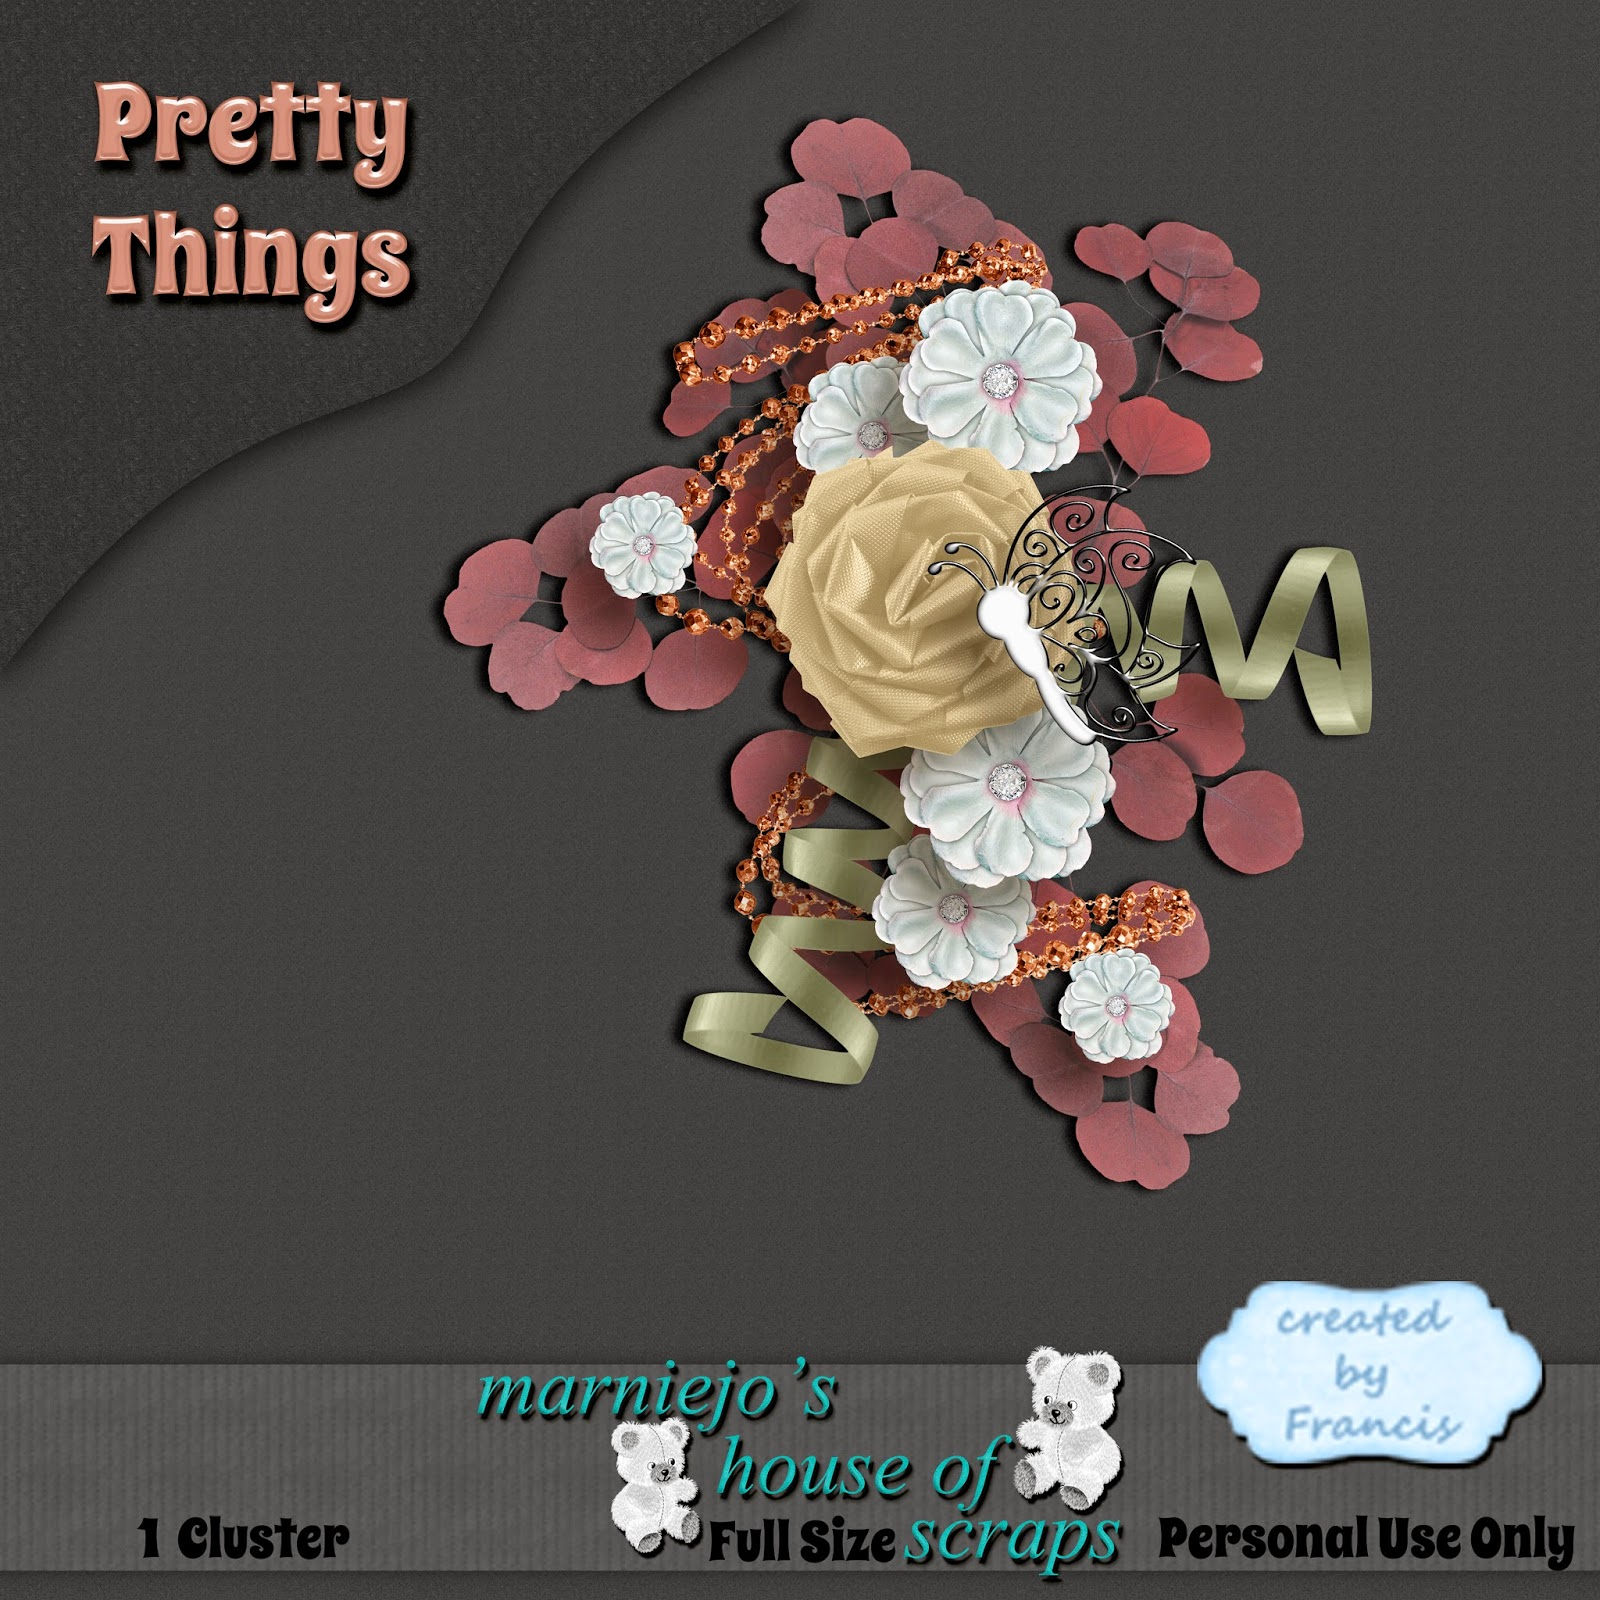 http://2.bp.blogspot.com/-DEP43U8DaFs/VM-7AHzK4vI/AAAAAAAAETw/QU5jV9PH8n8/s1600/PrettyThings_Cluster_preview.jpg